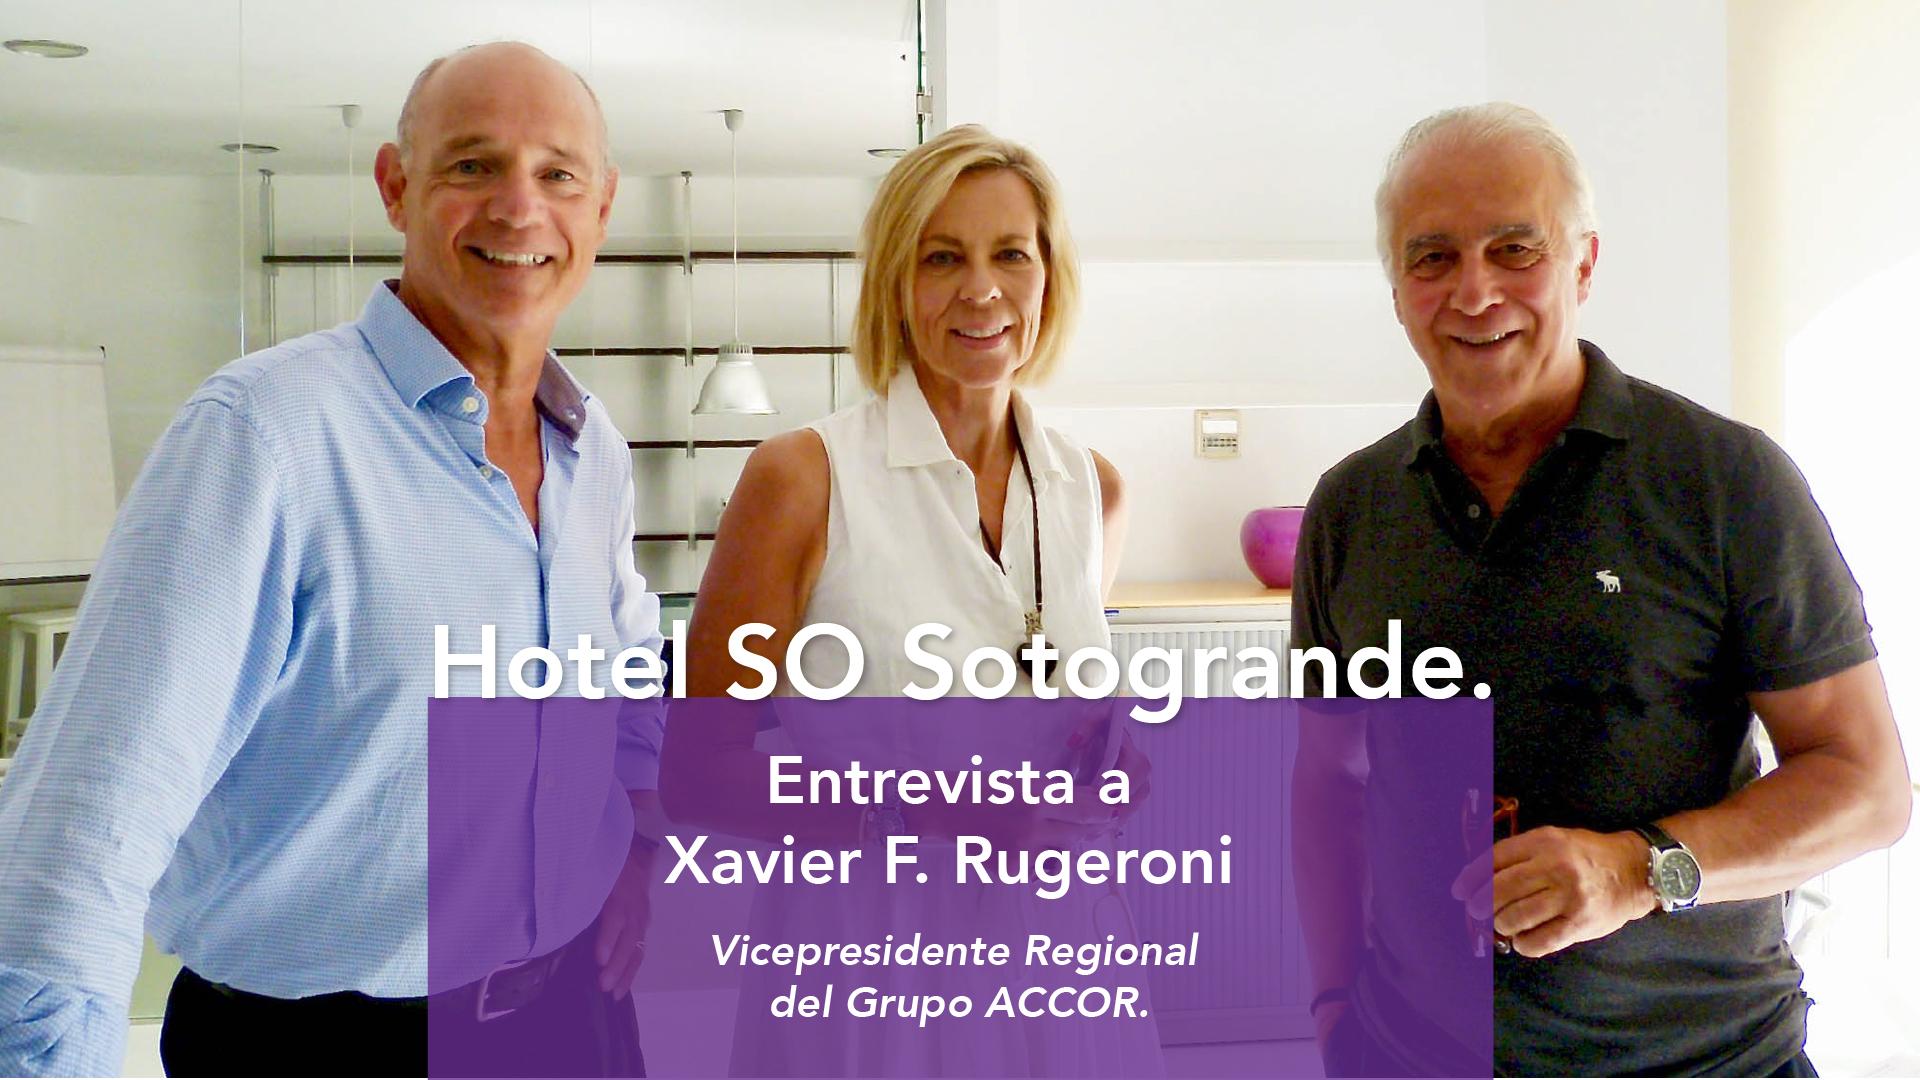 charles-gubbins-stephanie-noll-xavier-rugeroni-accor-hotel-so-sotogrande-1